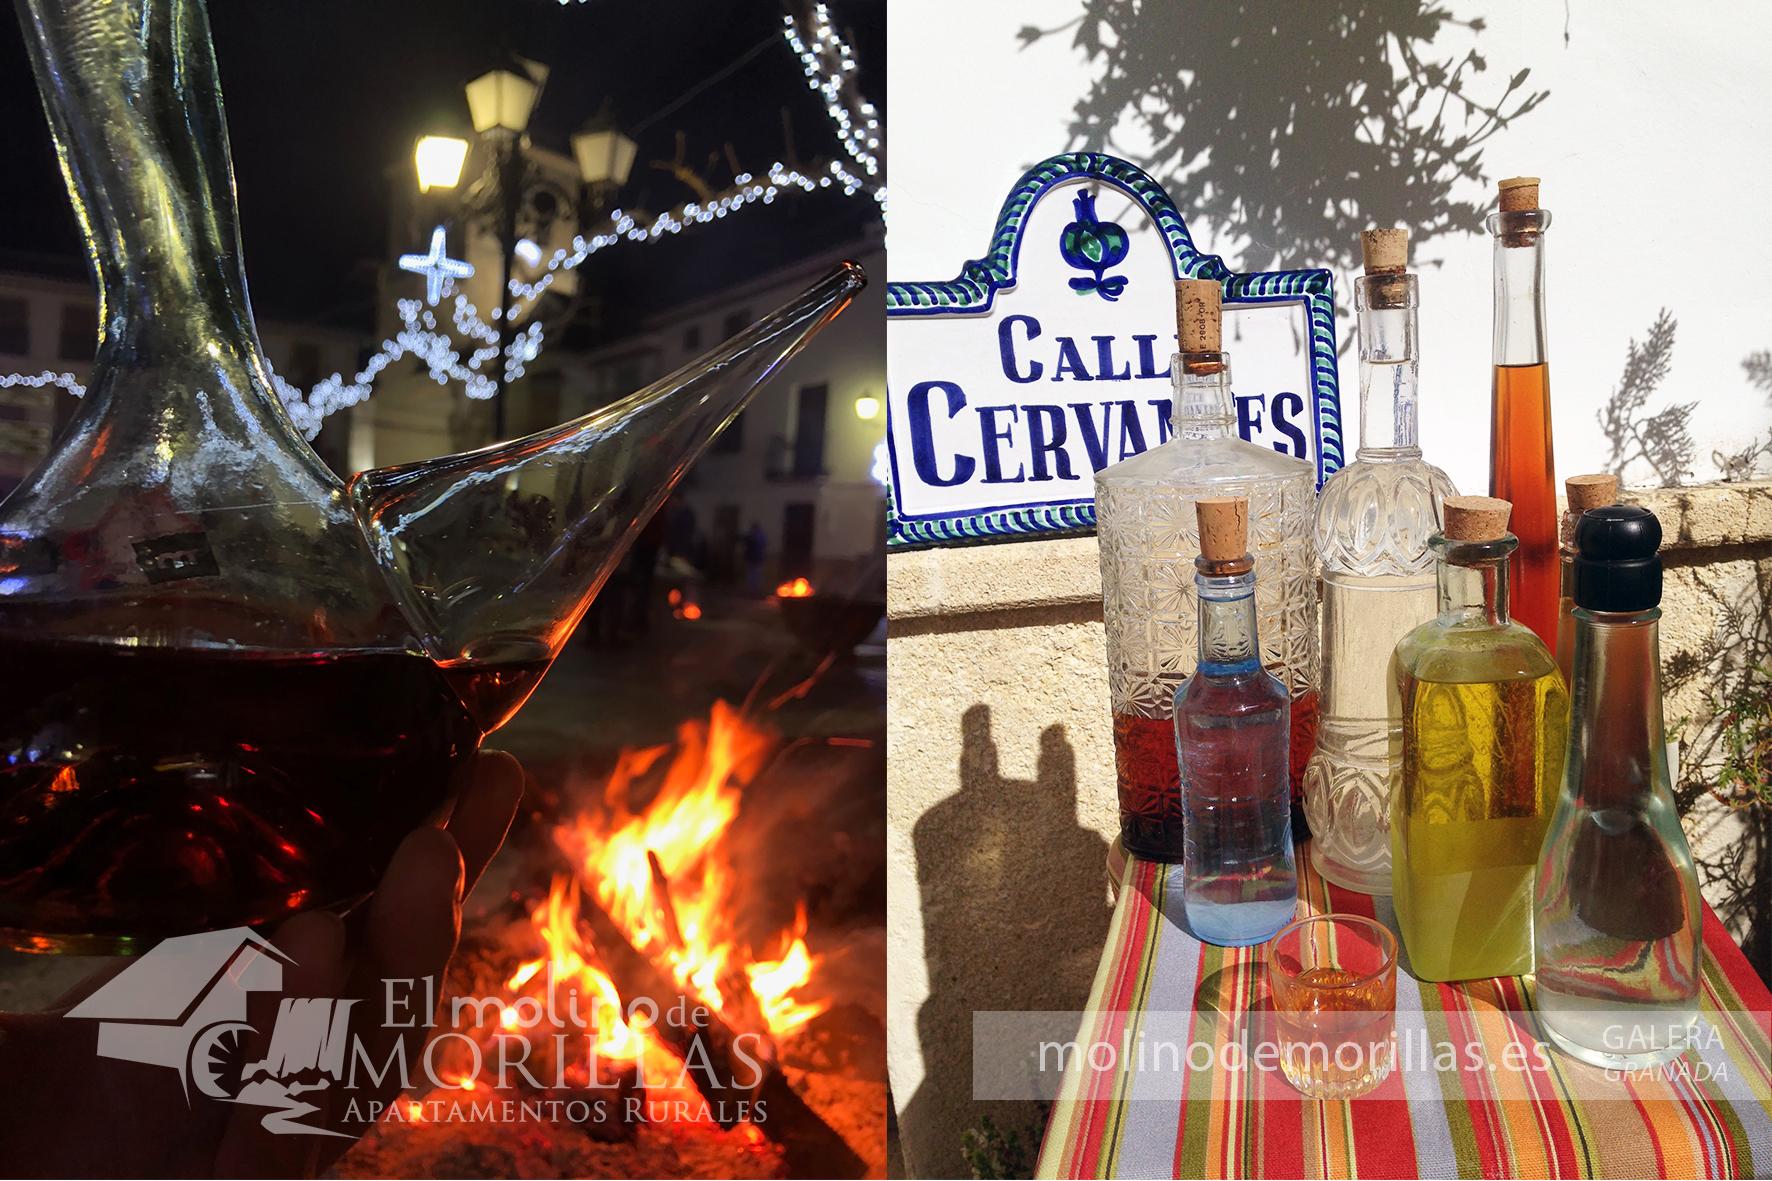 Vino y Licores tradicionales de Galera: mistela, churripampli, gloria, licor café, orujo de uva